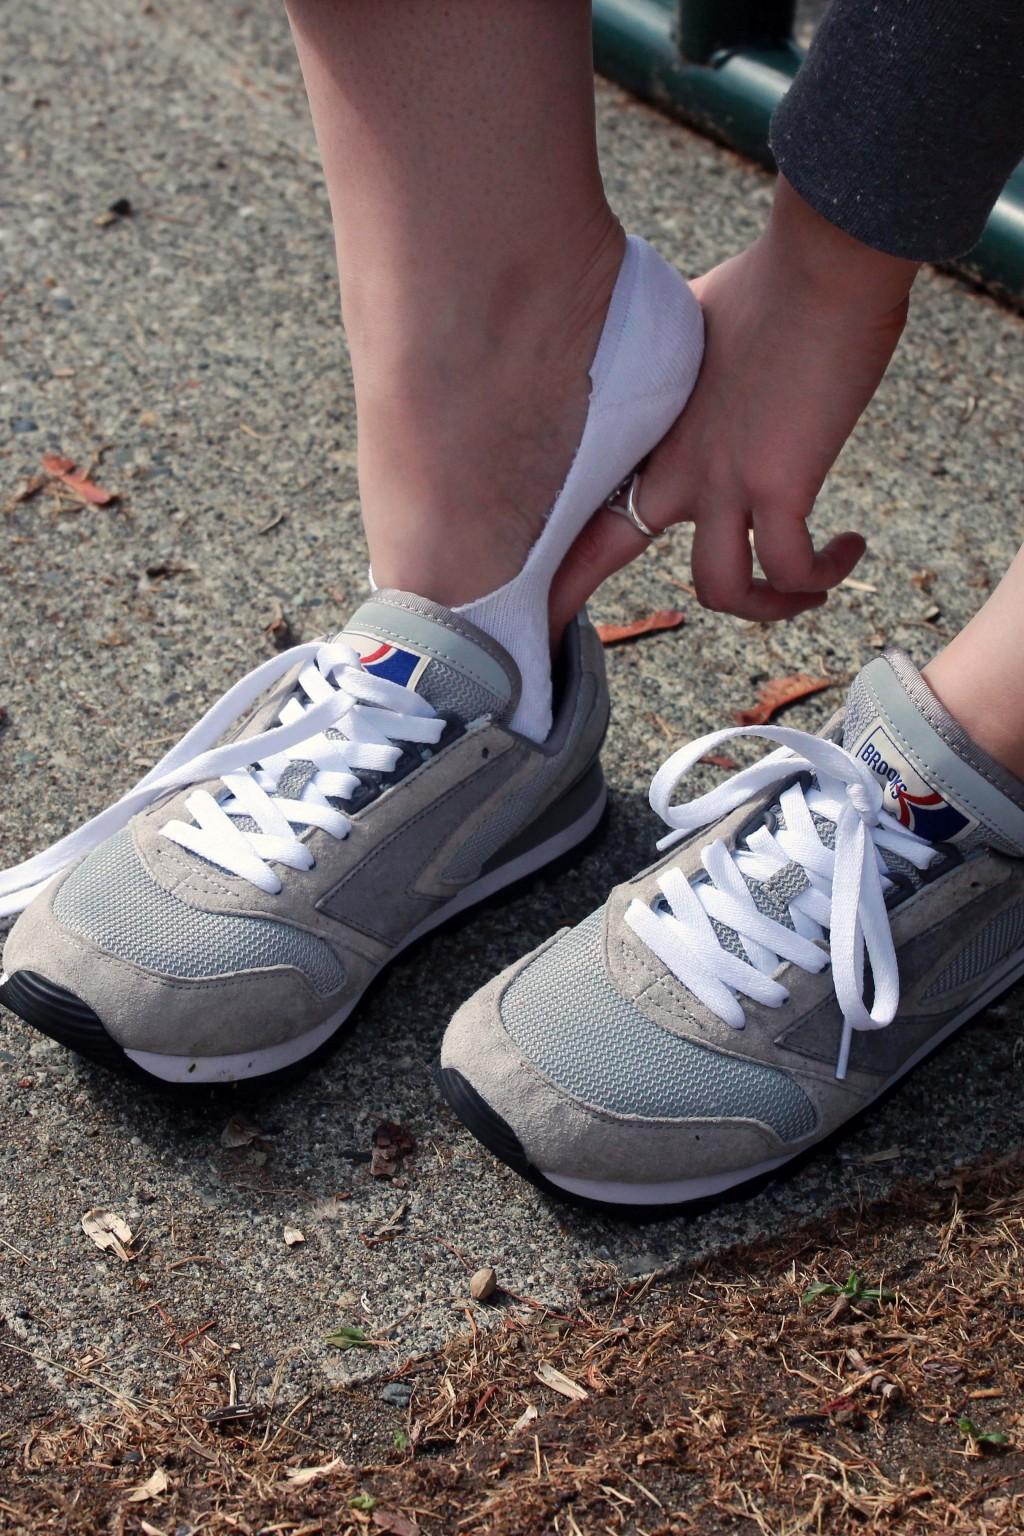 Kushy Foot Athletic Half Socks